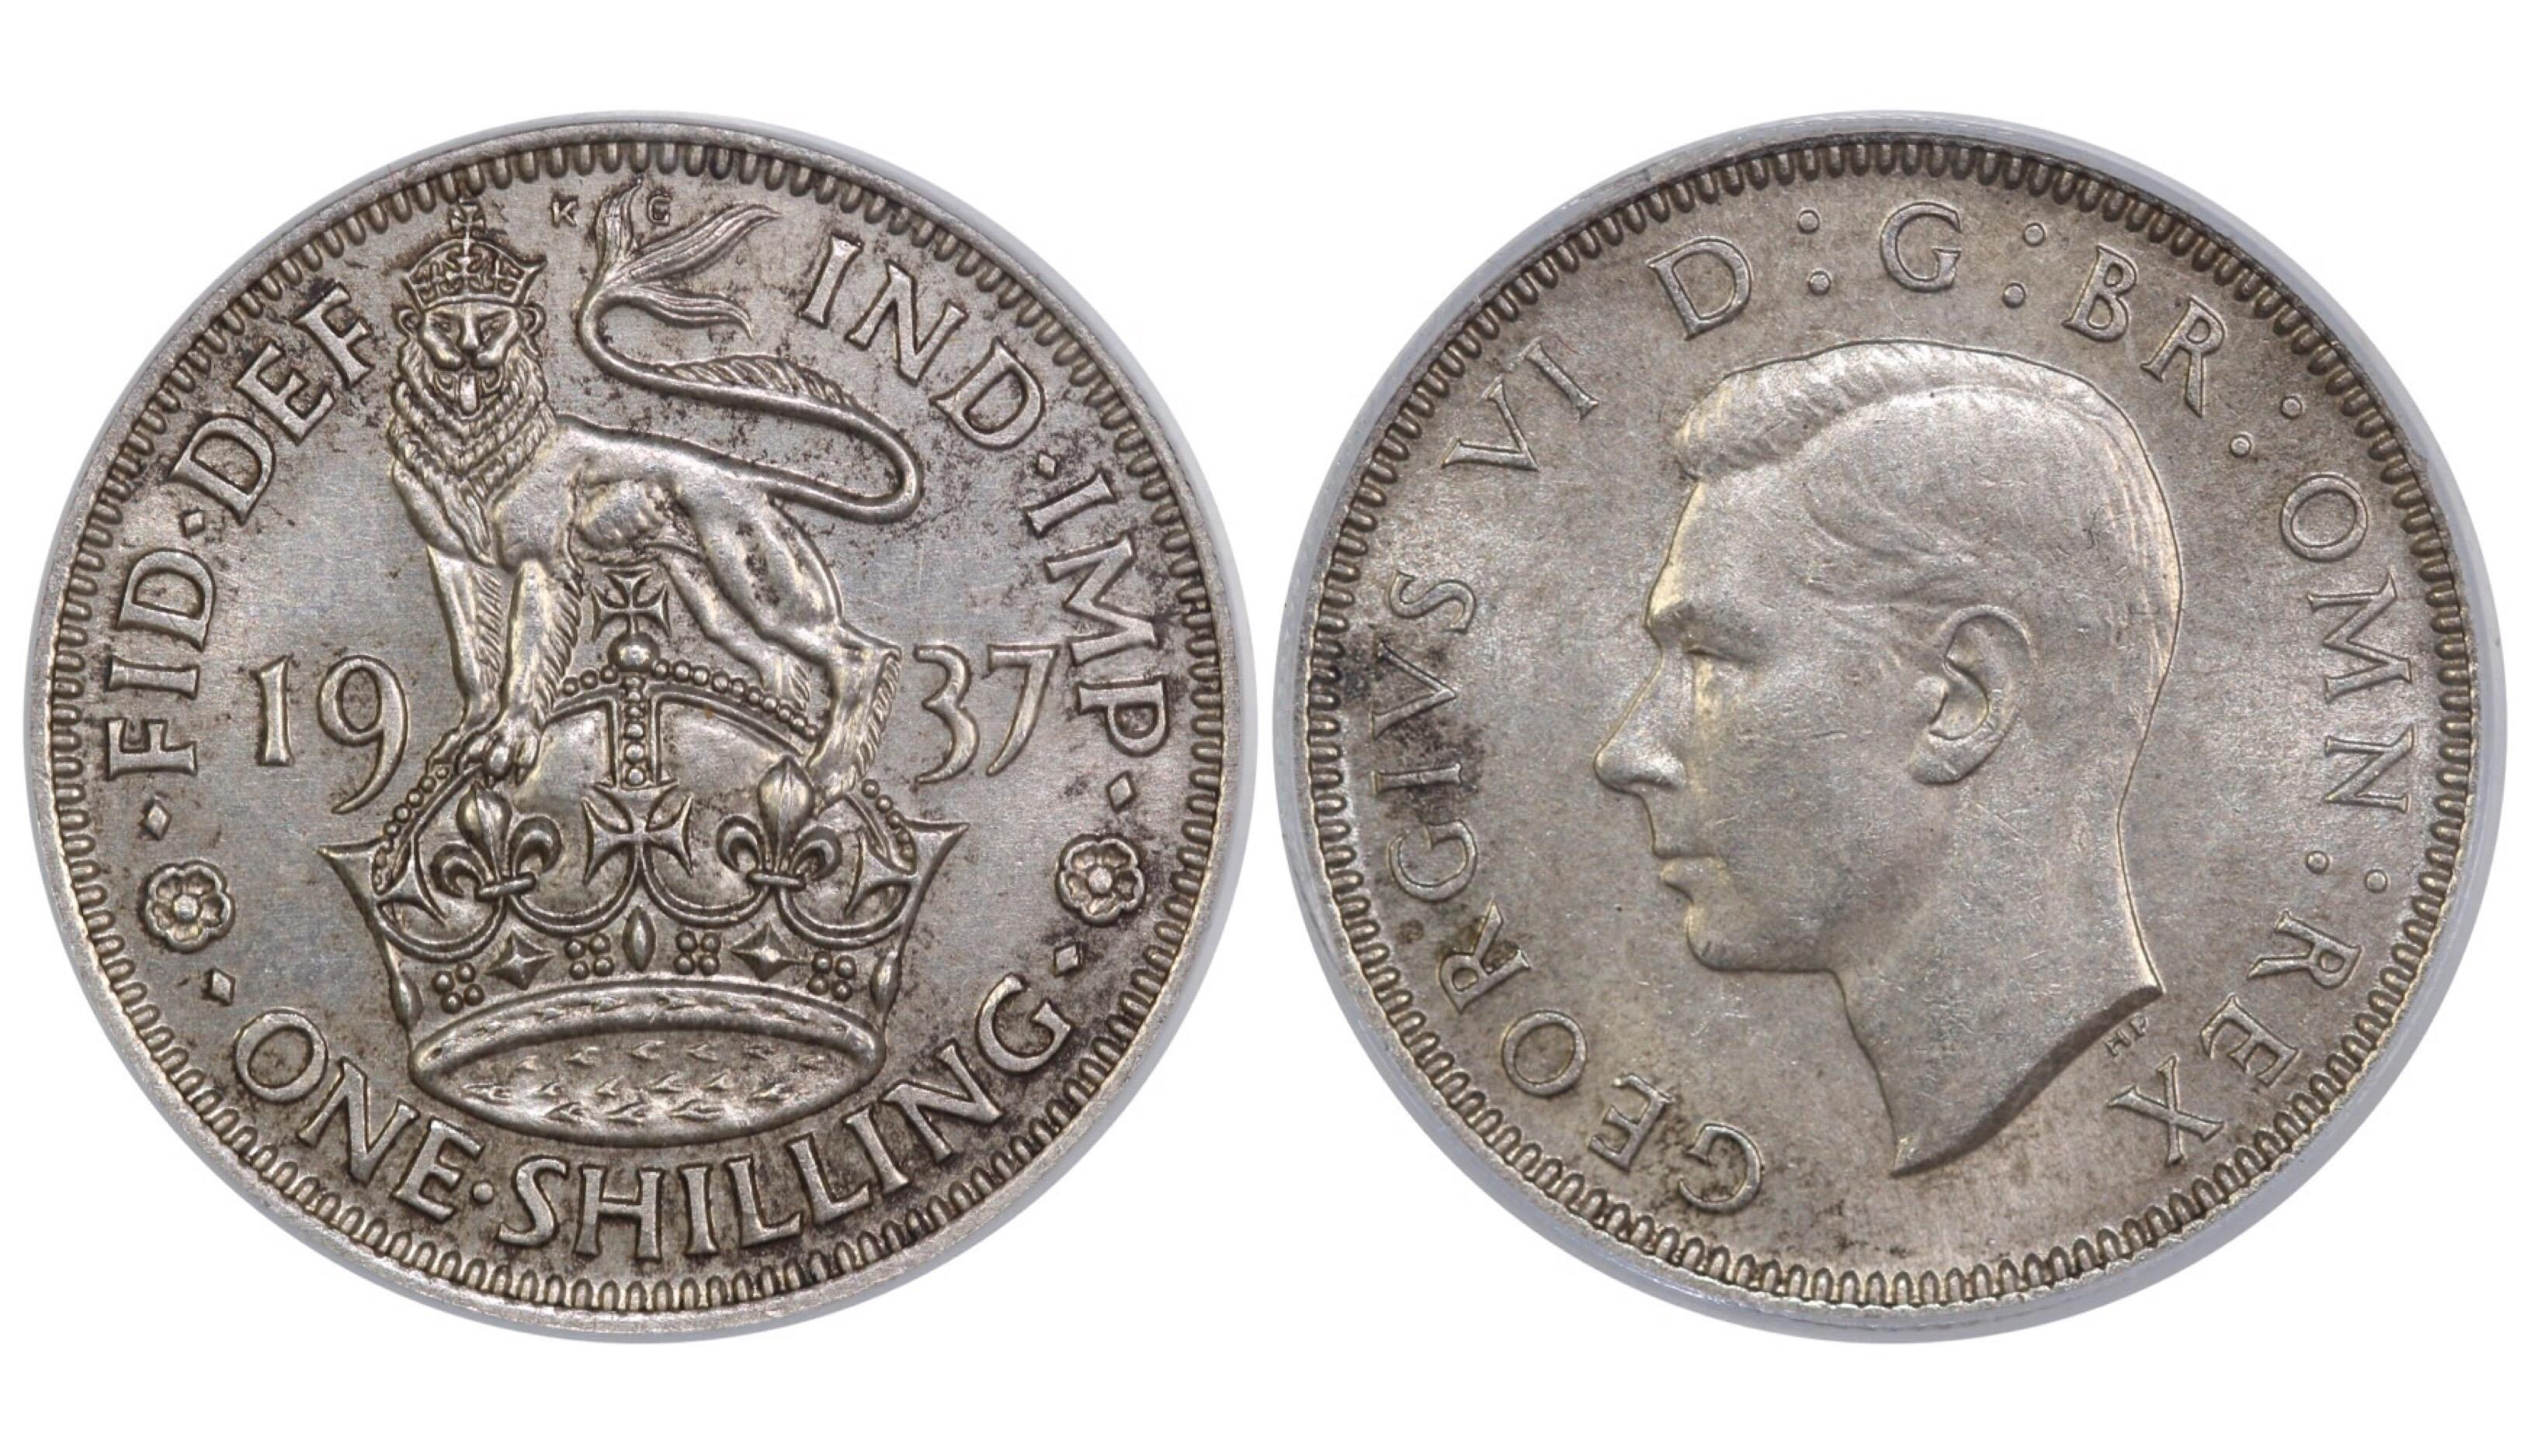 1937 'English' Shilling, CGS 65, George VI, ESC 1450, UIN 20847